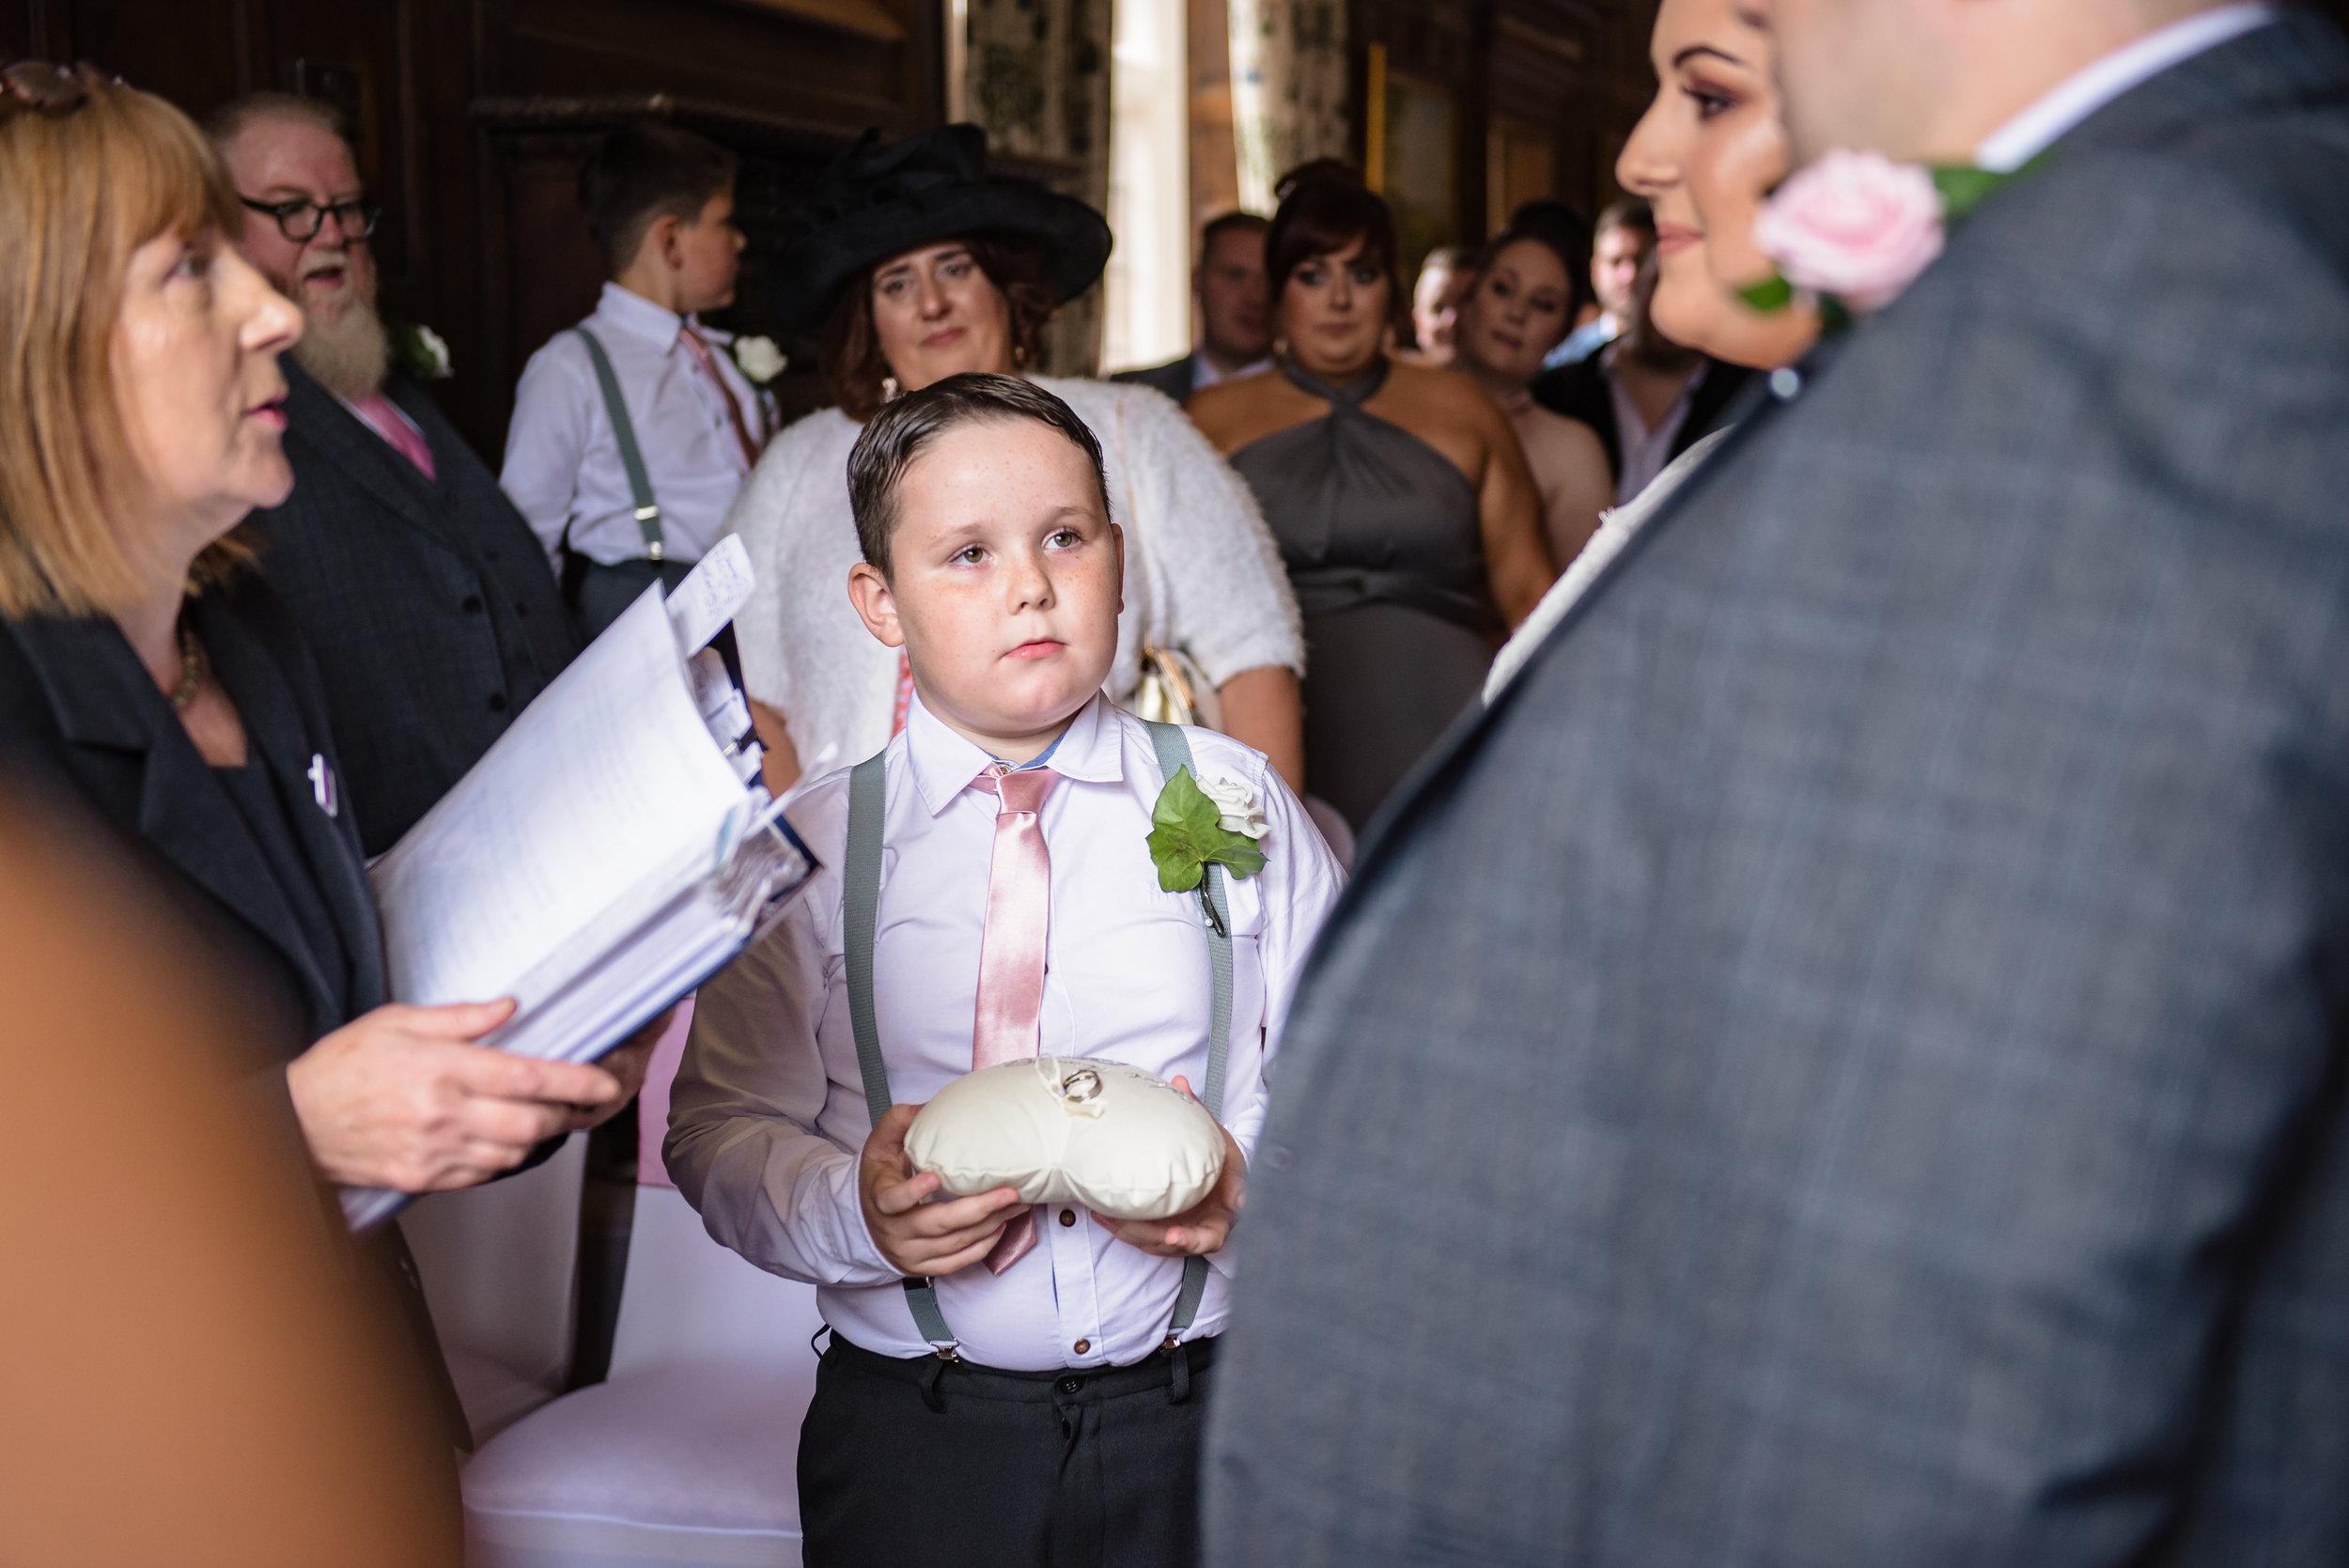 castle Bromwich hall hotel wedding photography run bearer